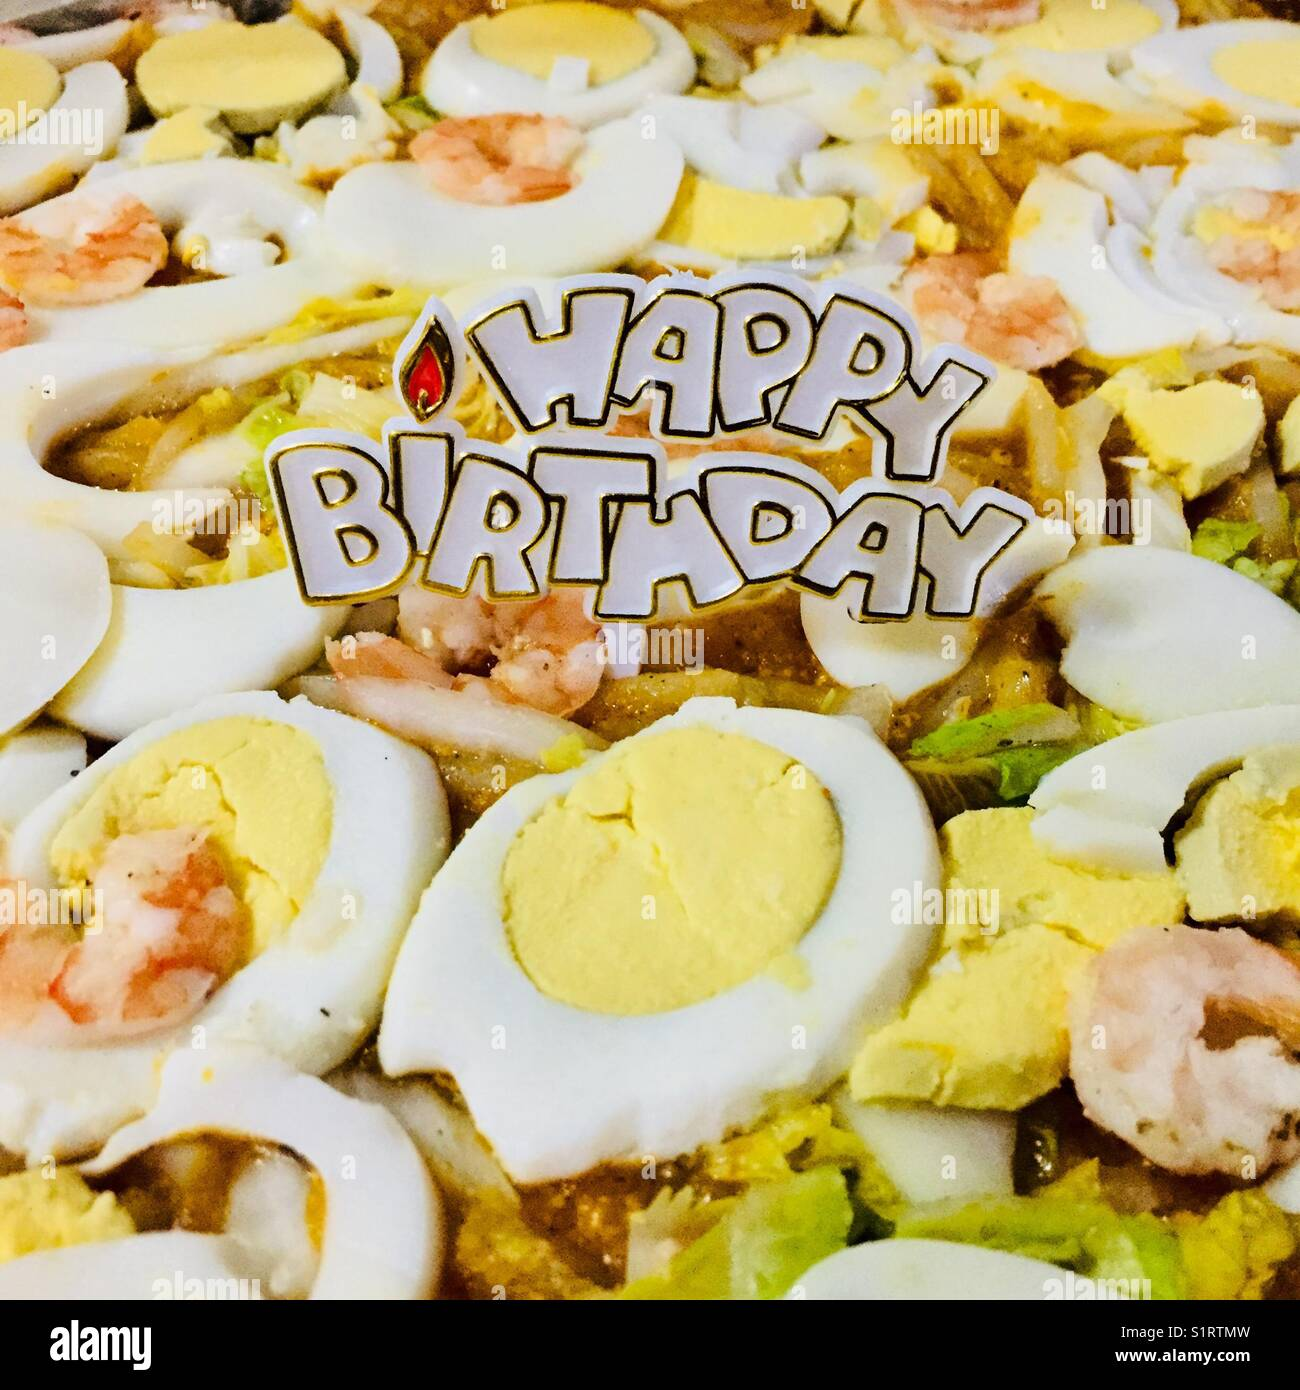 Geburtstag Essen Stockfoto Bild 310925577 Alamy